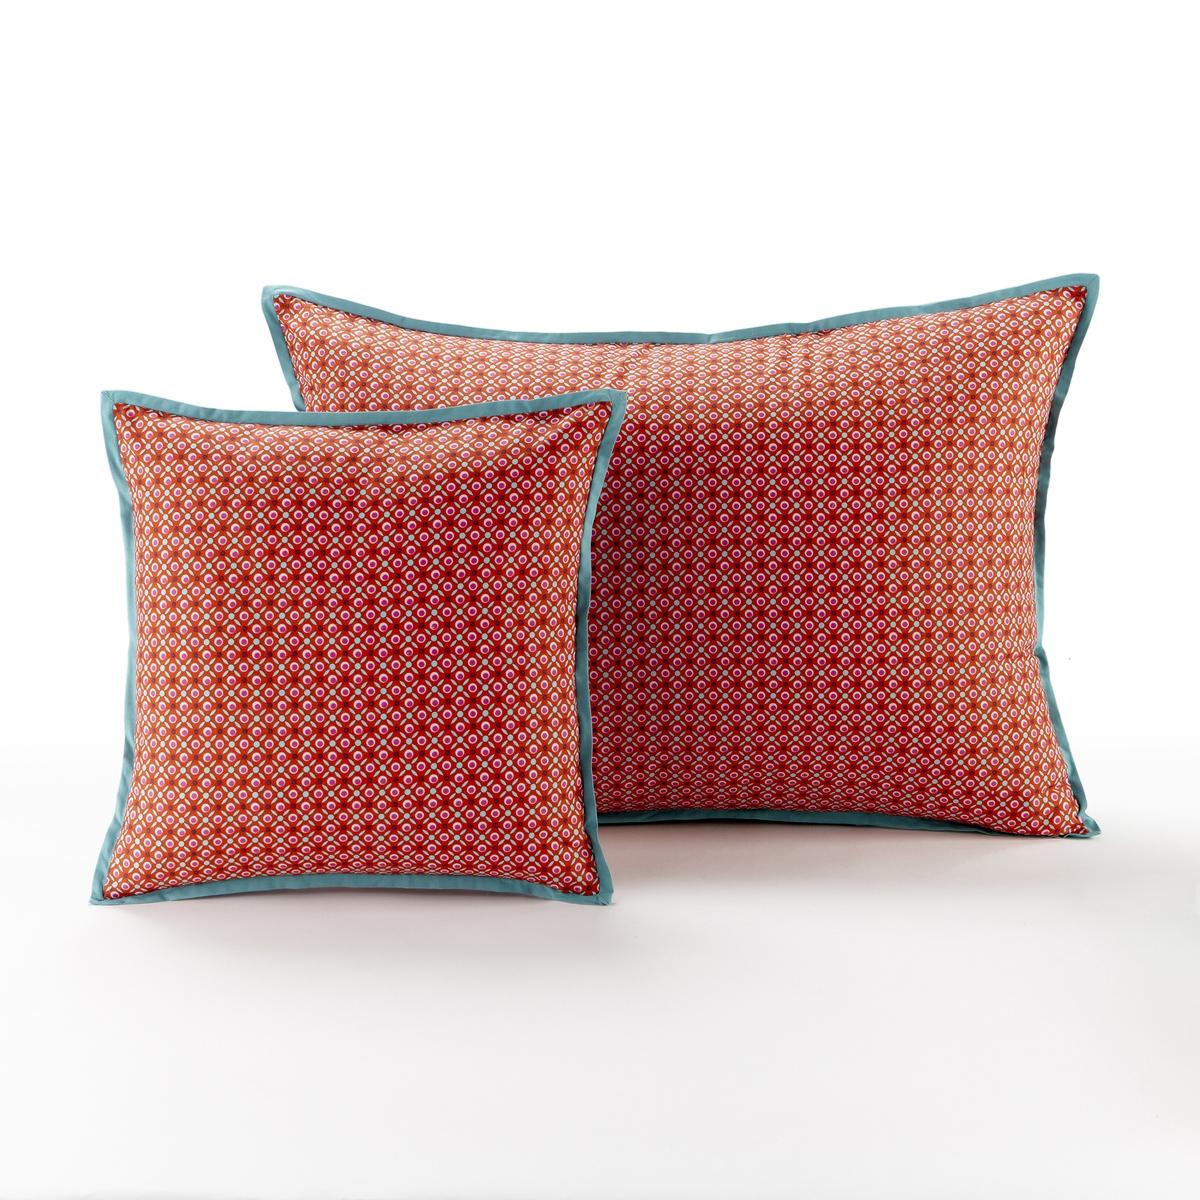 Наволочка на подушку-валик или подушку, NILAR